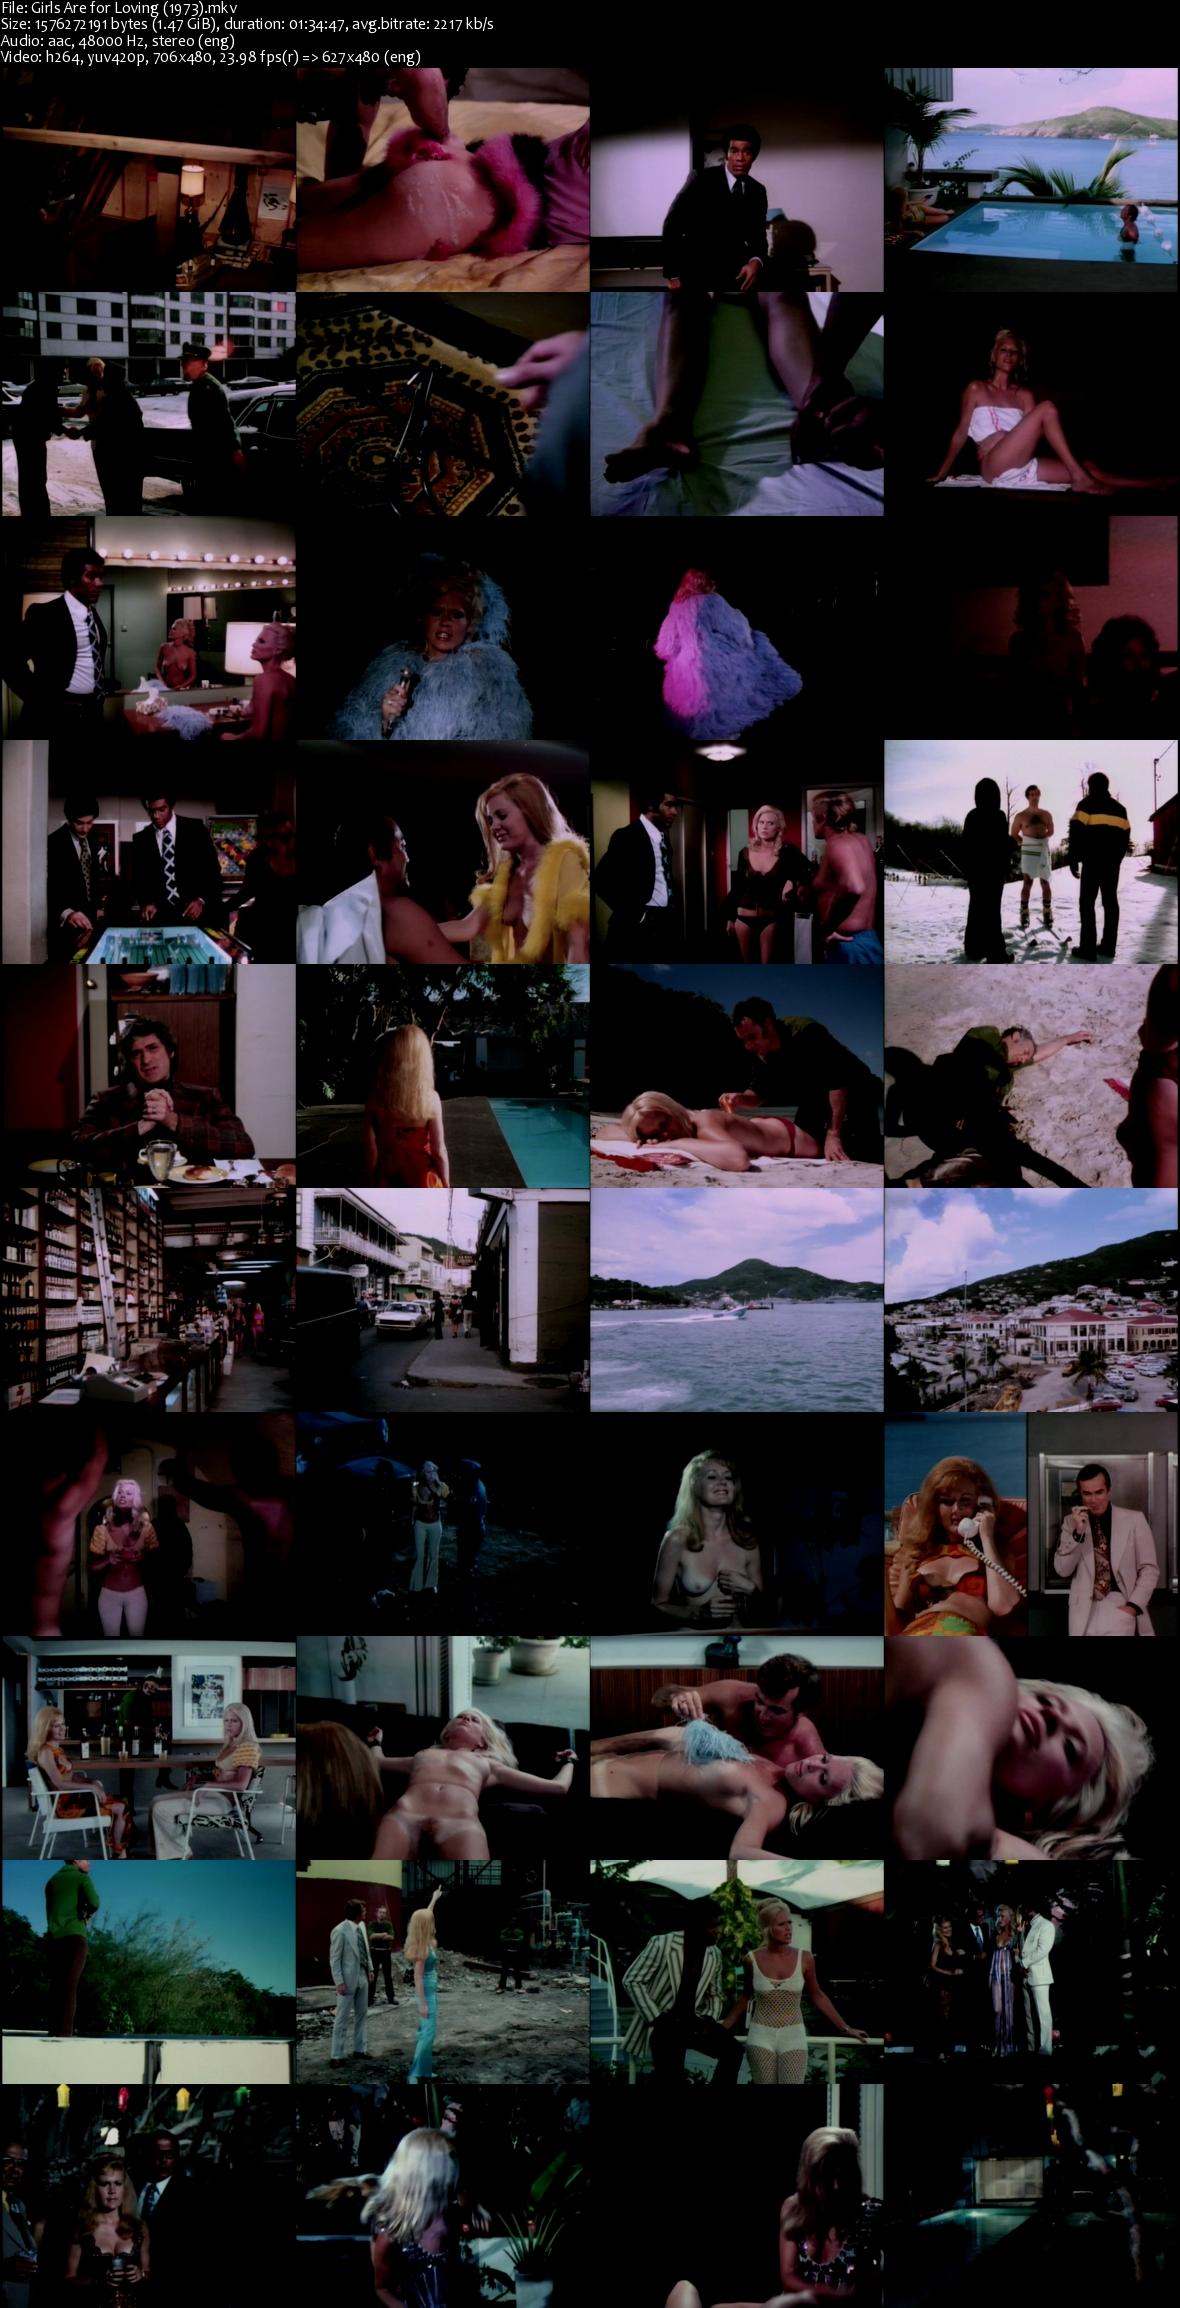 The dallas connection 1994 b movie - 3 5